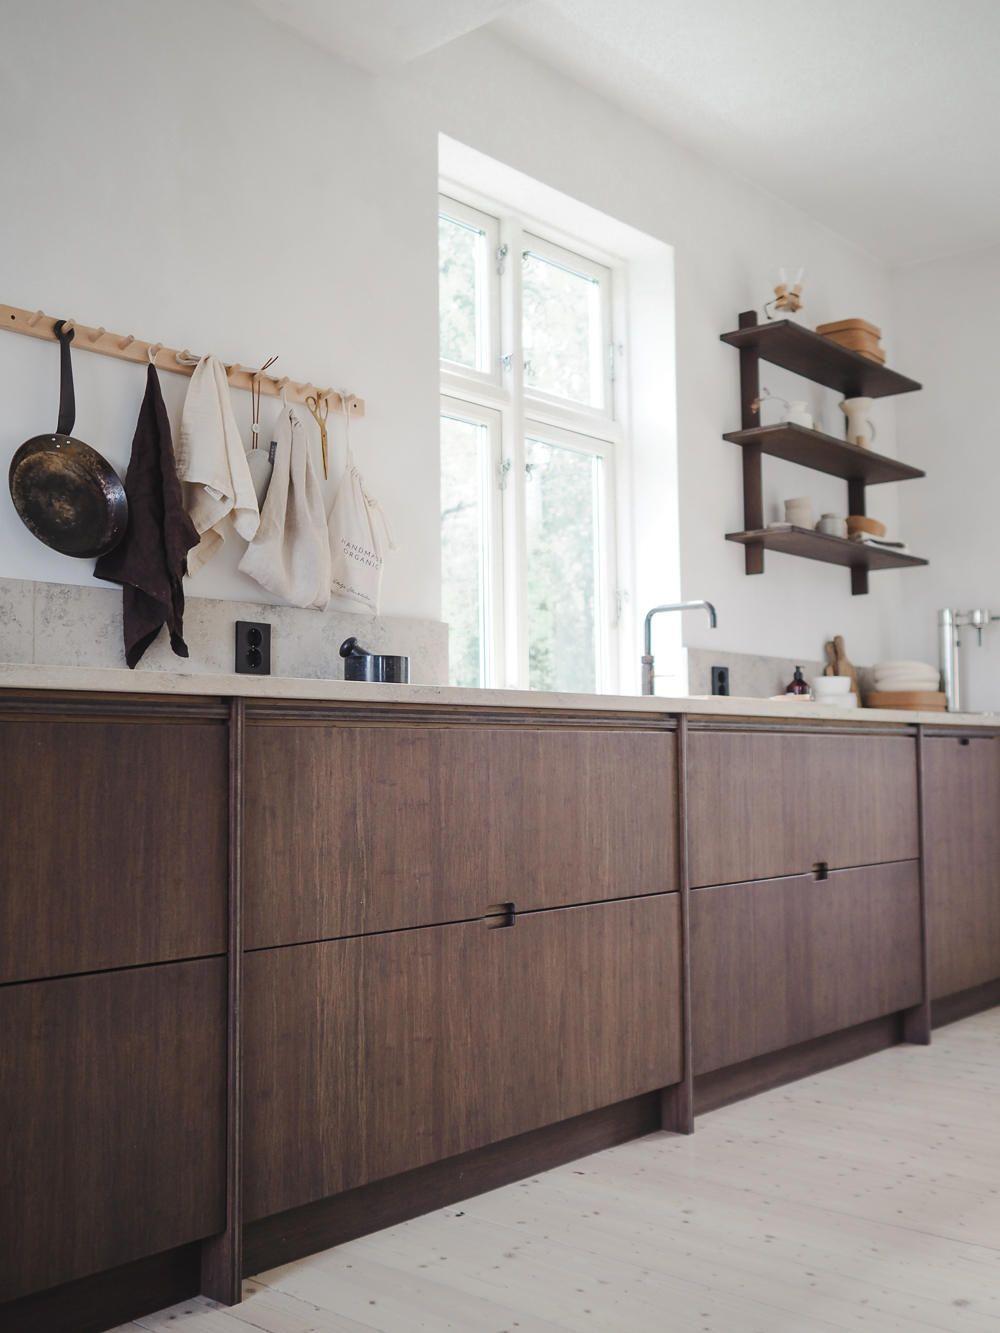 The All Bamboo Kitchen Ask Og Eng S Sustainable Kitchen Design Kitchen Design Rustic Kitchen Design Interior Design Kitchen